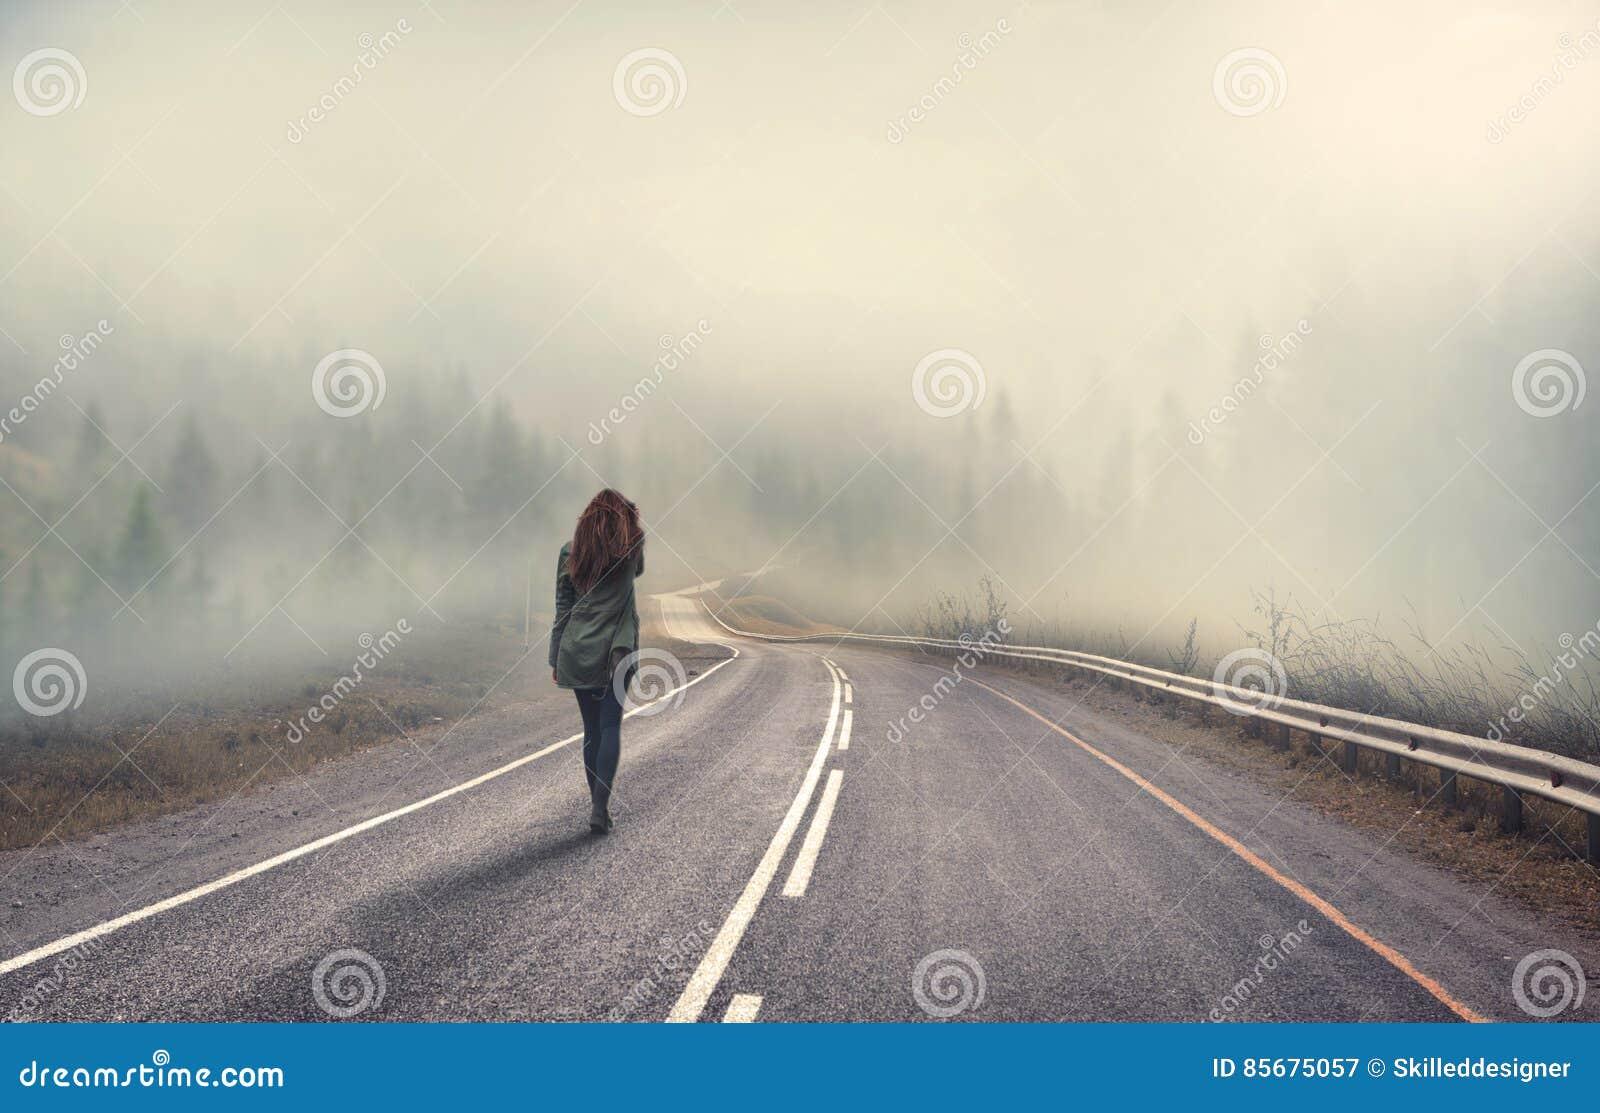 girl walking alone